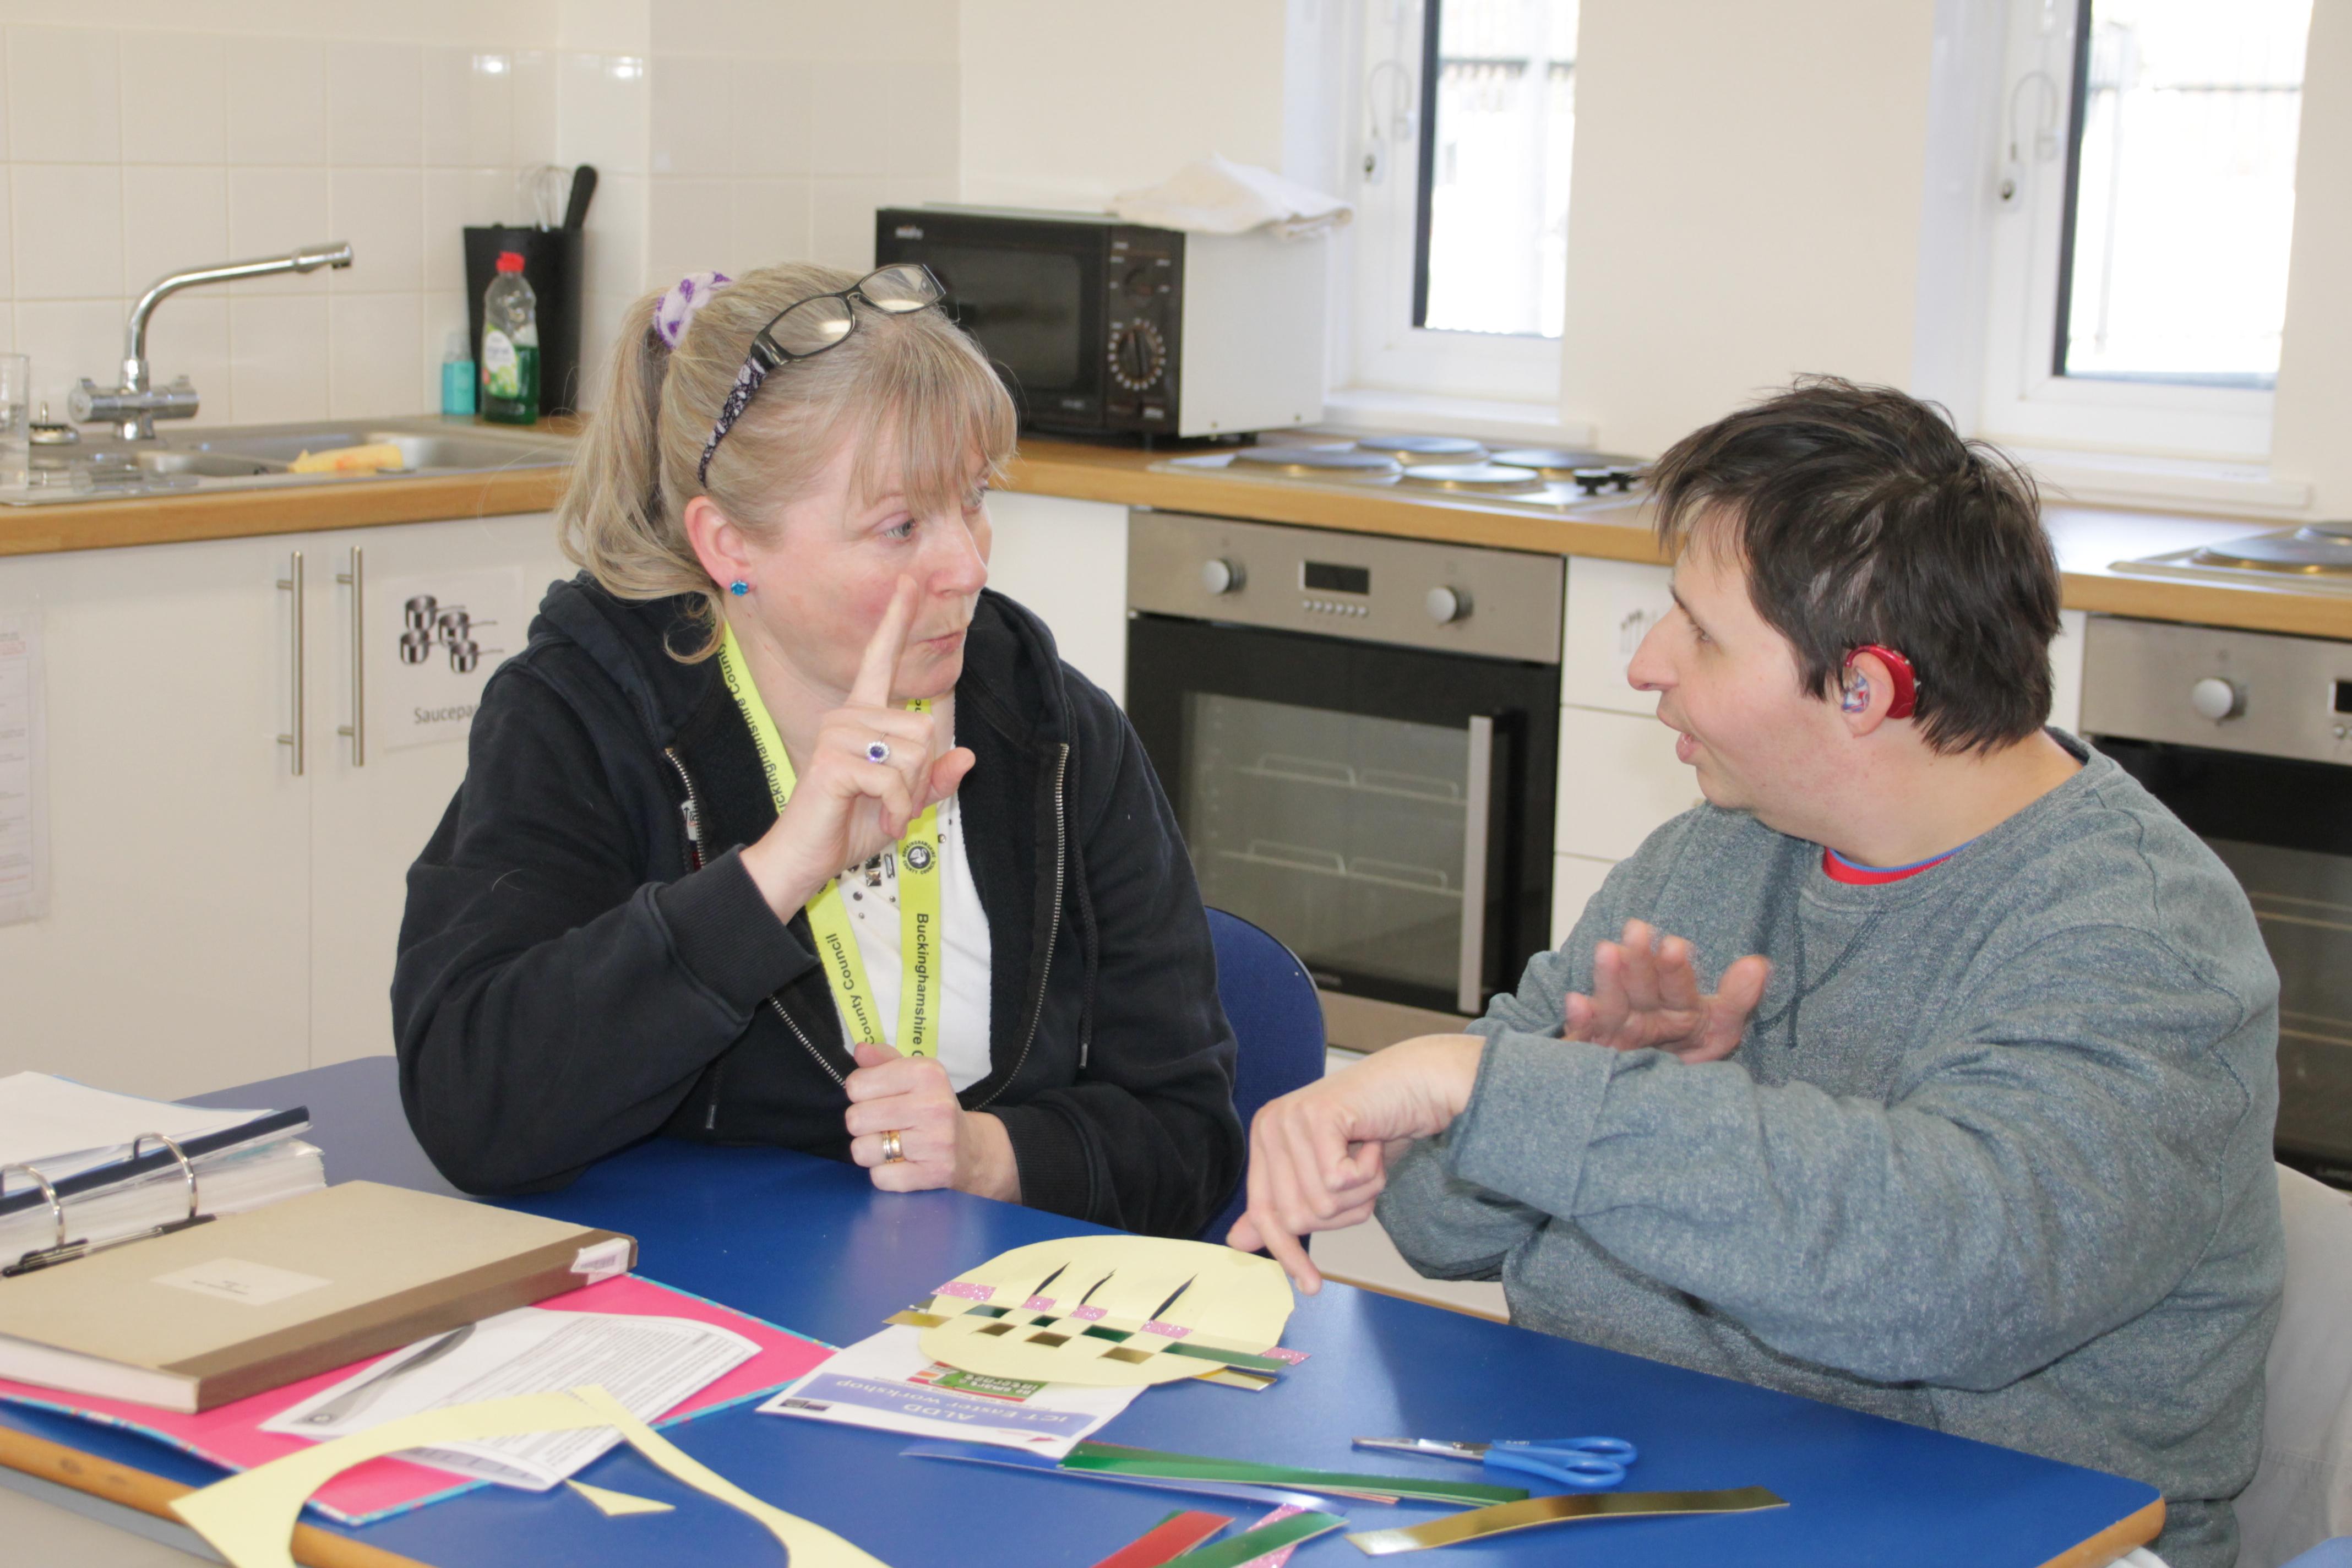 Two people communicating using sign language